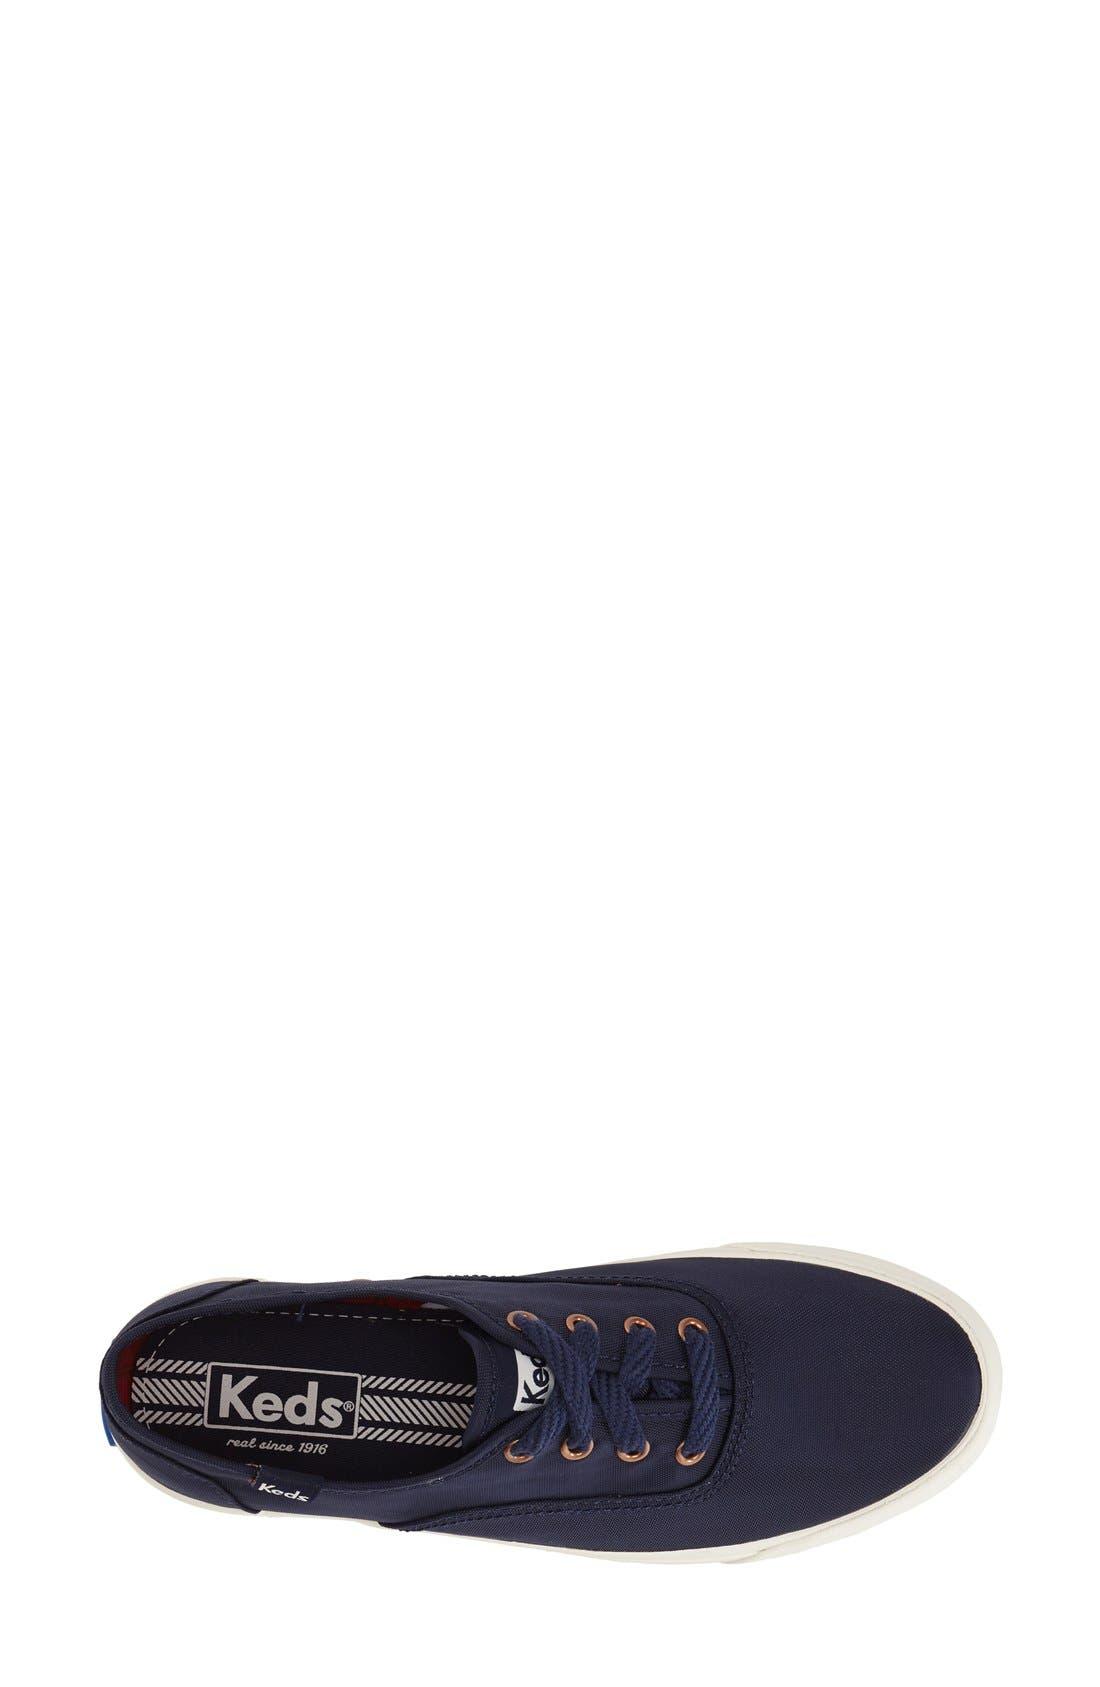 Alternate Image 3  - Keds® 'Triumph' Sneaker (Women)